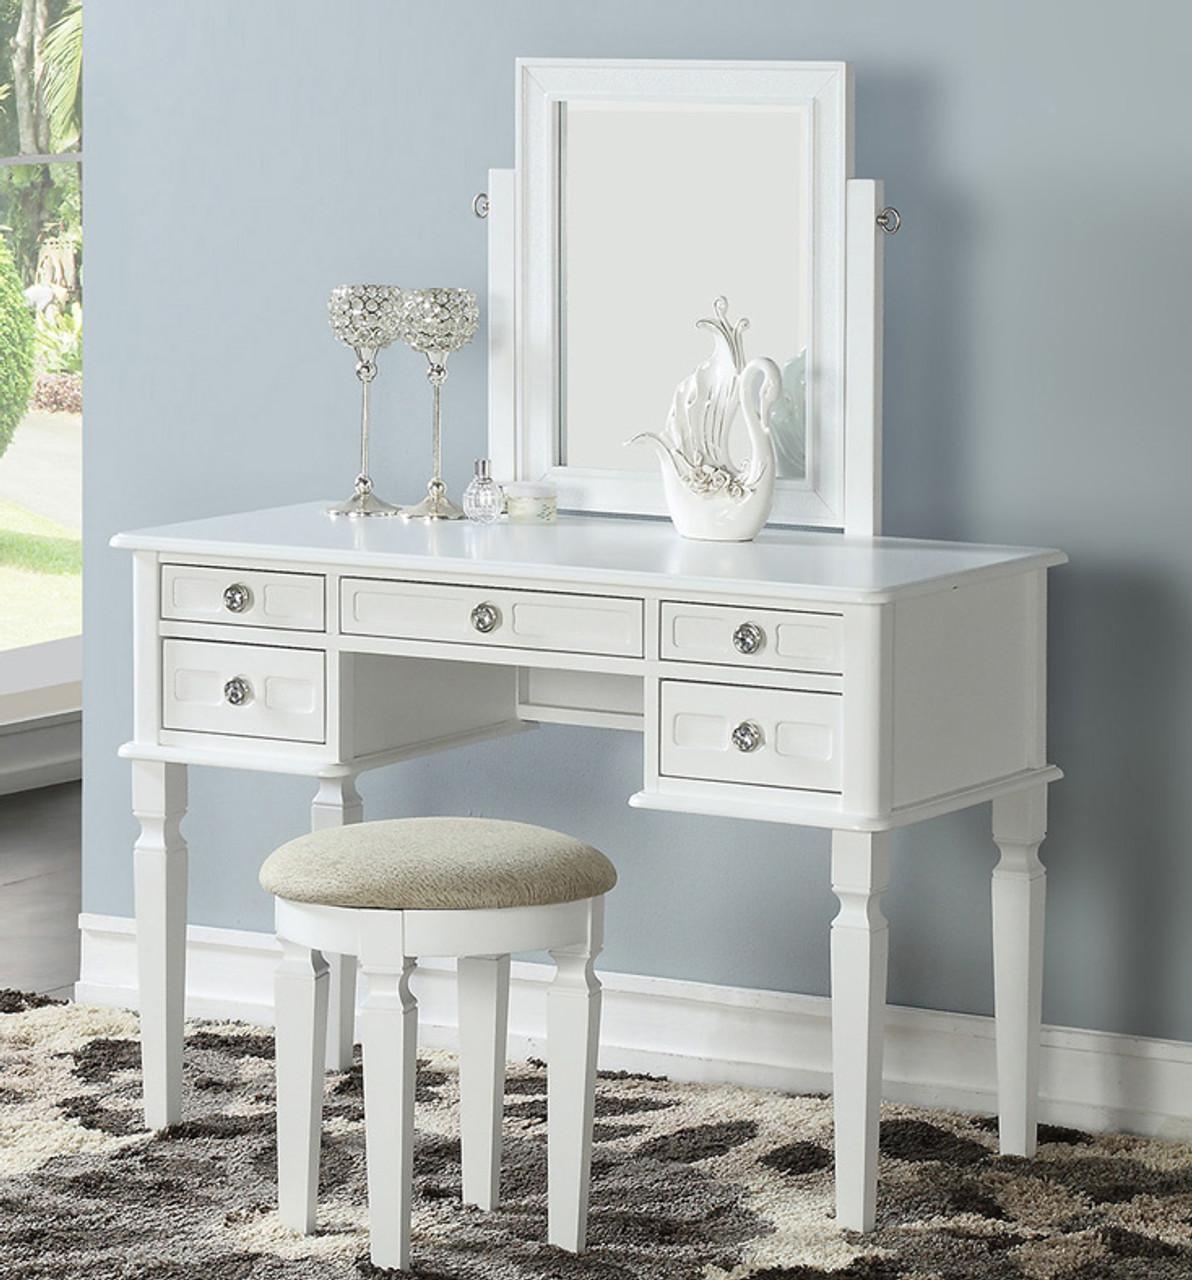 Montana Bedroom Vanity Set w/ Drawers